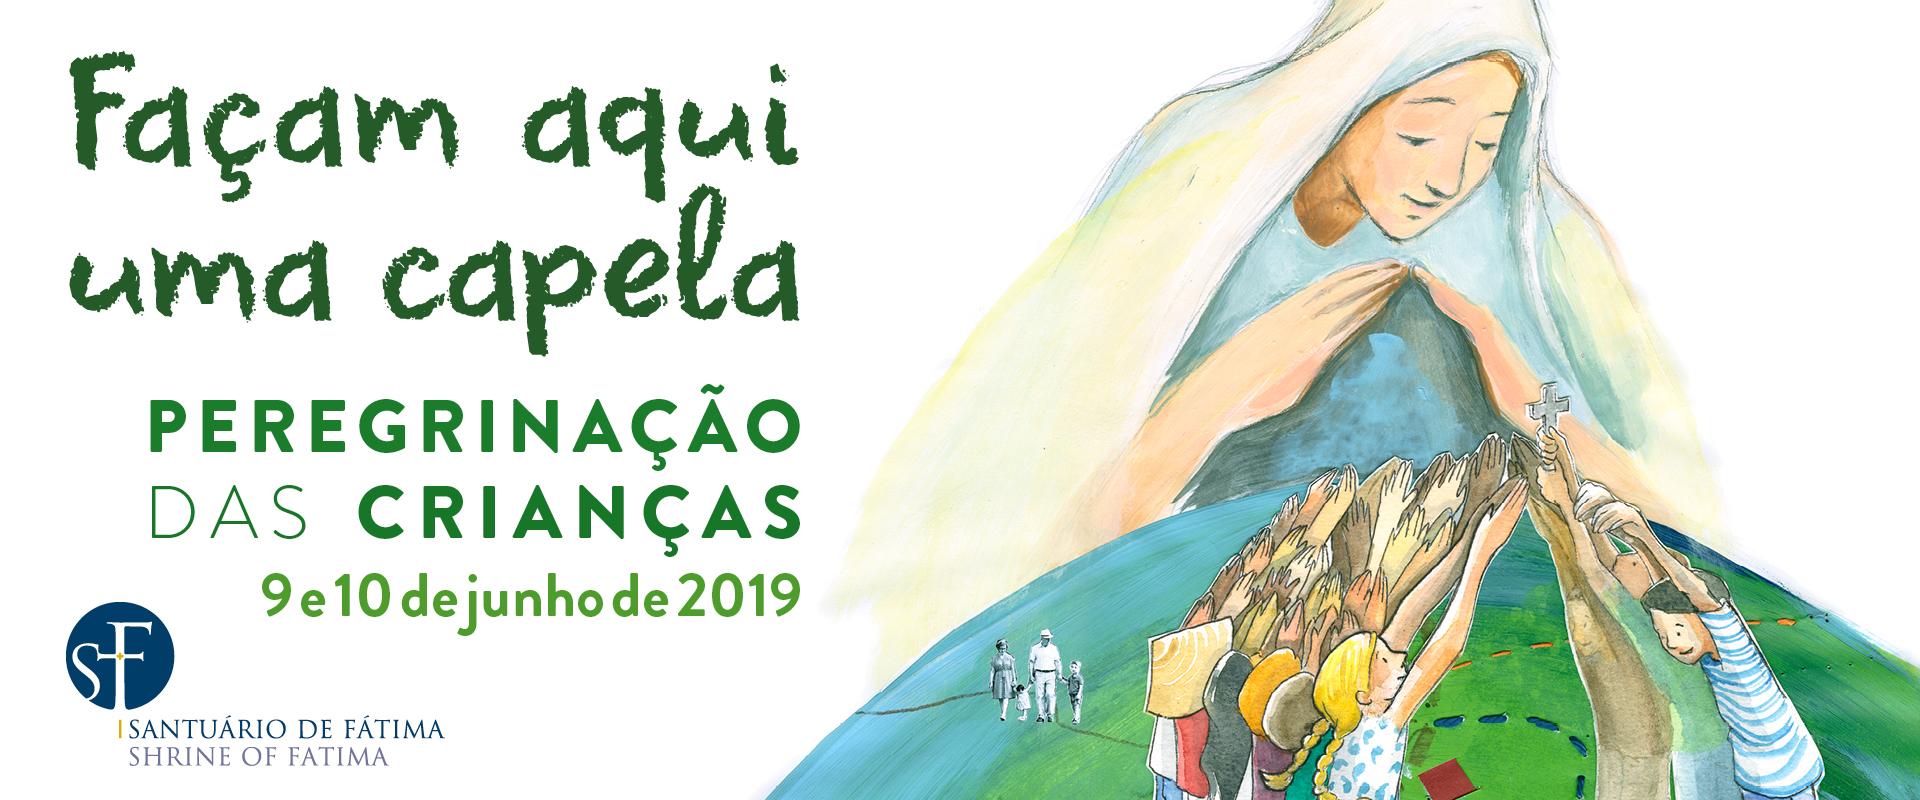 2019-04-05_2_Cartaz Per Criancas 2019 740x400.jpg